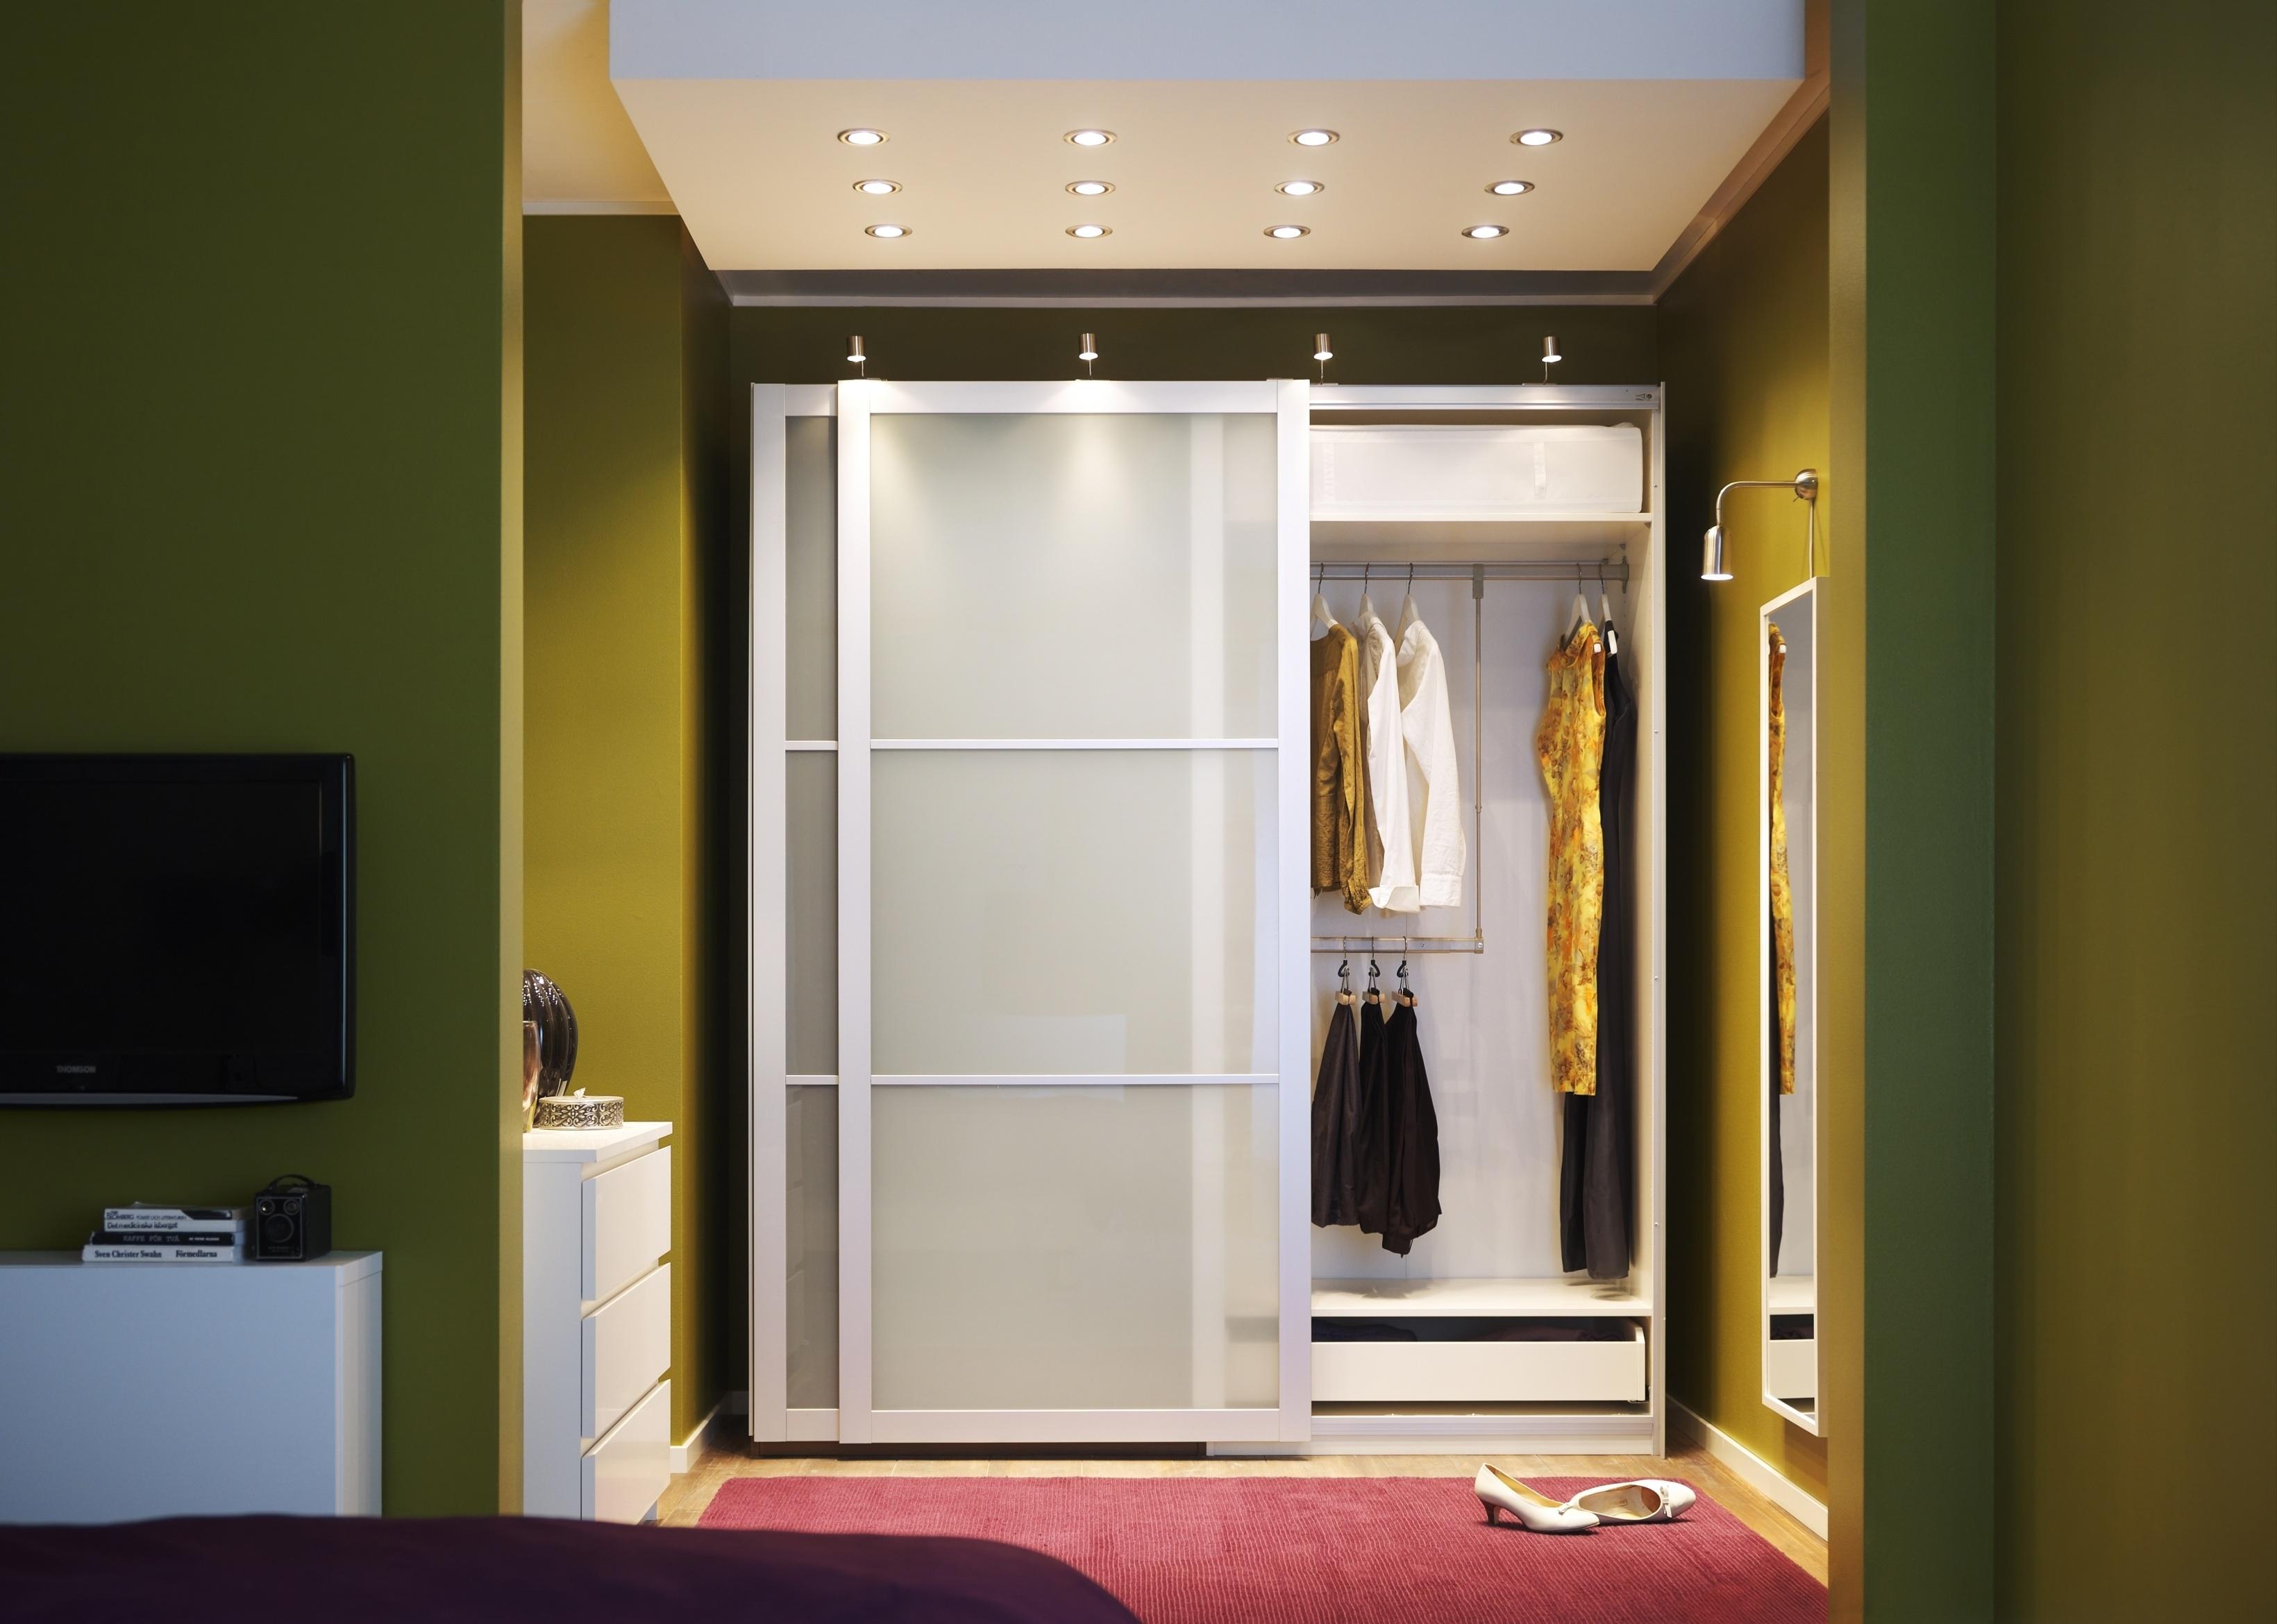 Bedroom Wardrobe Closet With Sliding Doors3280 X 2340